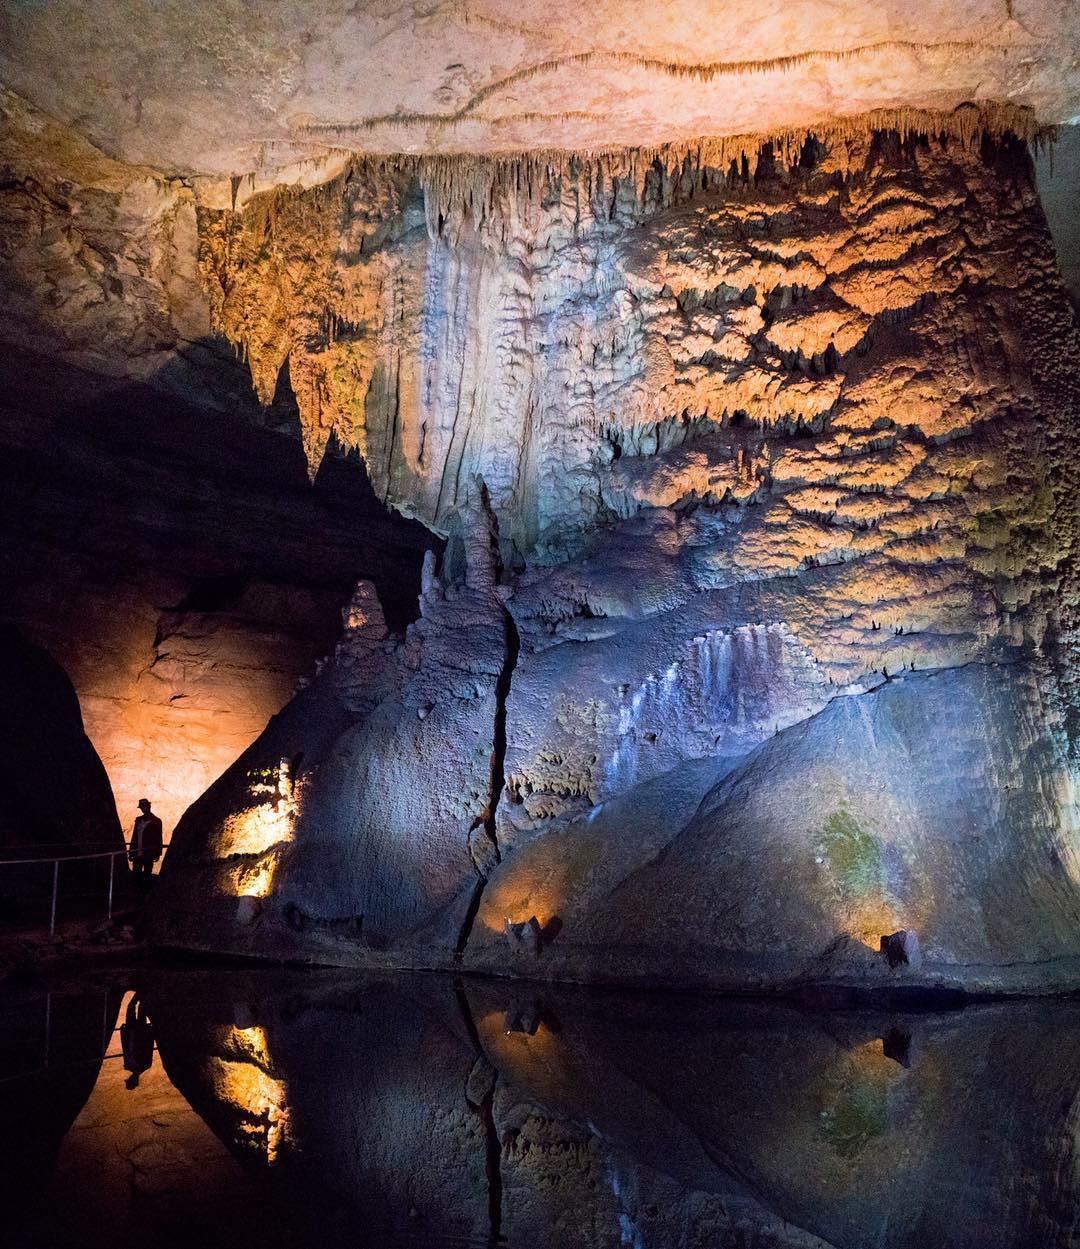 USA Photography Exploring Alabama's Waterfalls & Caves Cathedral Caverns Goliath